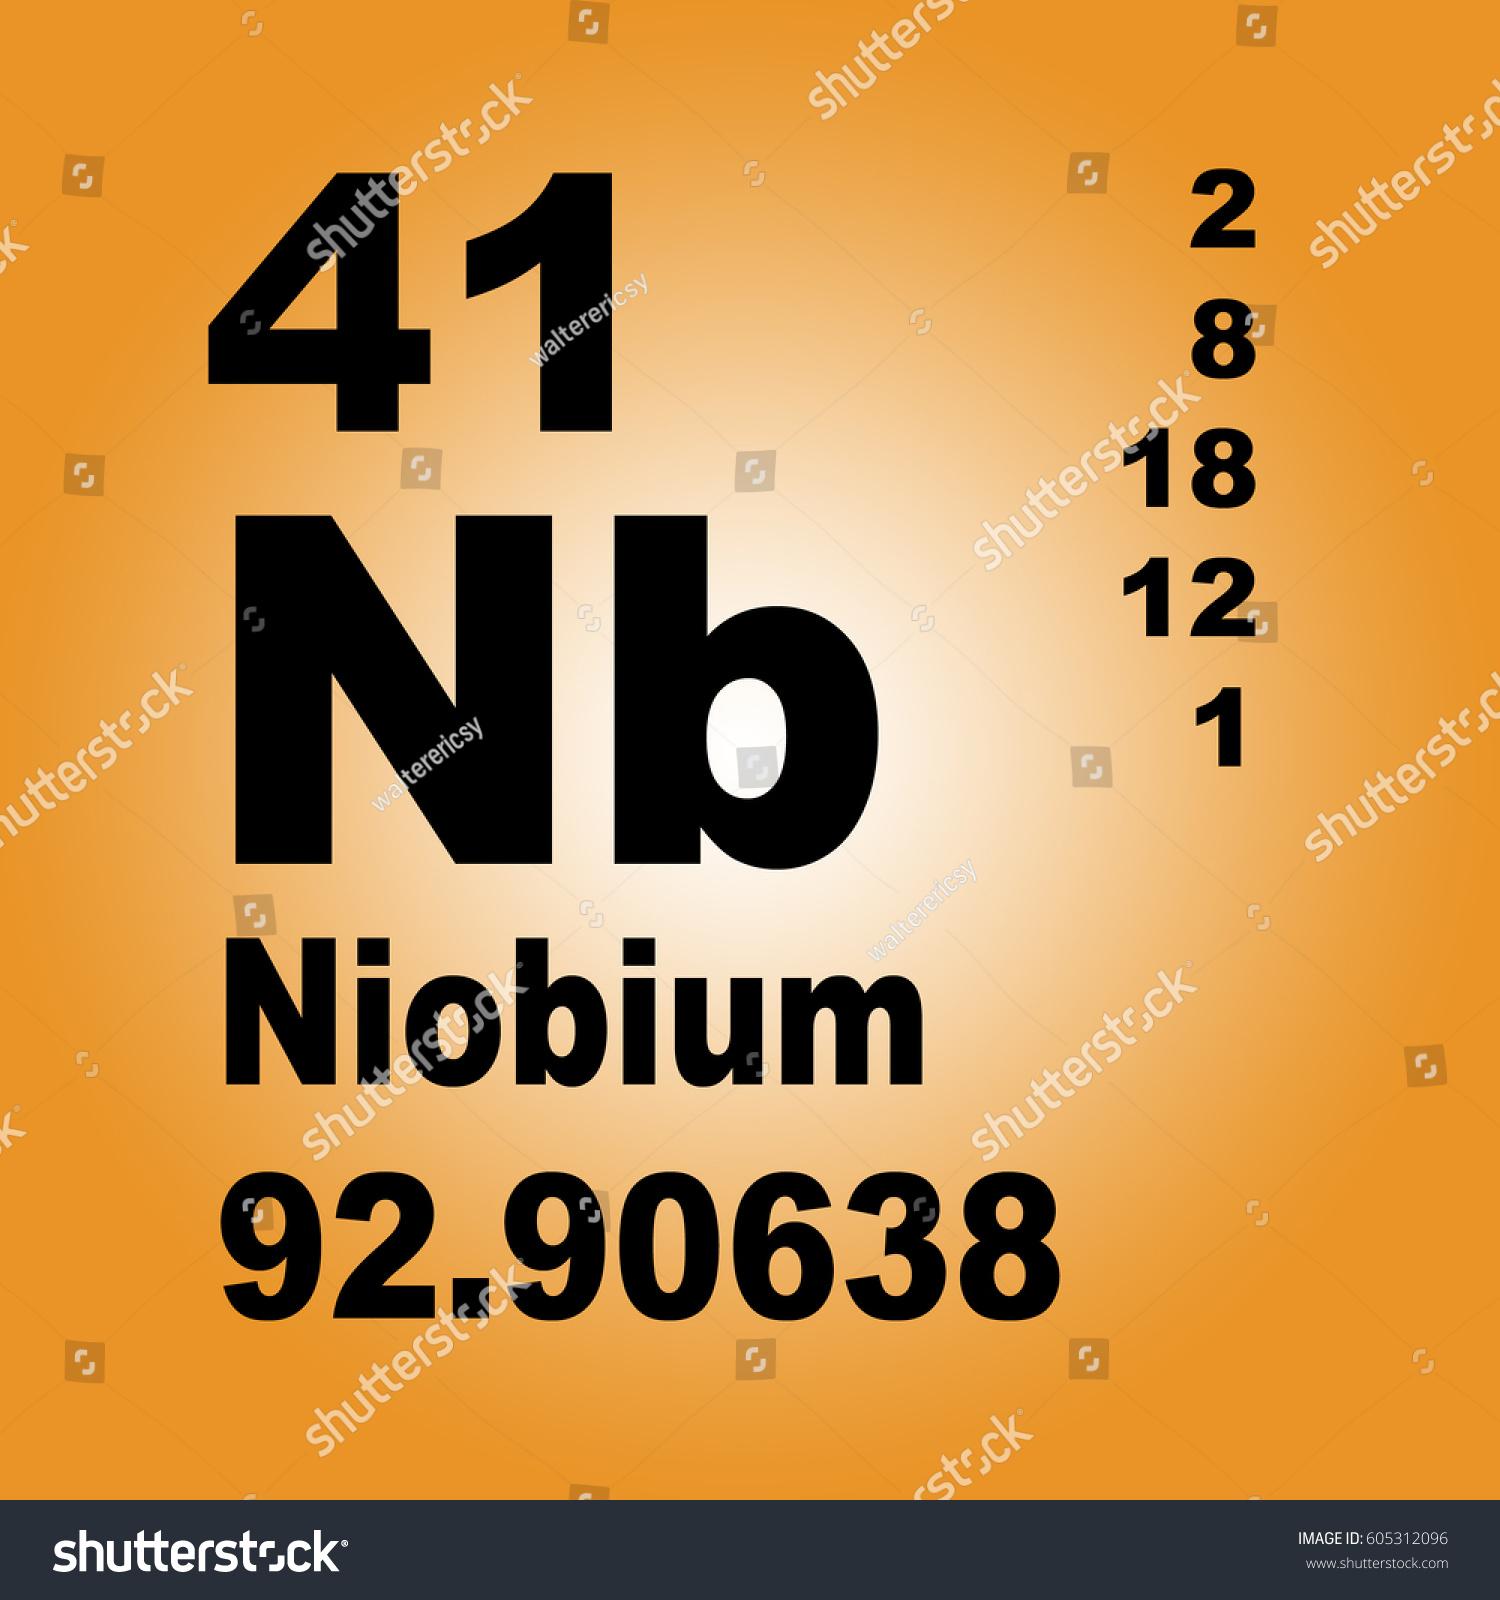 Niobium periodic table elements stock illustration 605312096 niobium periodic table elements stock illustration 605312096 shutterstock biocorpaavc